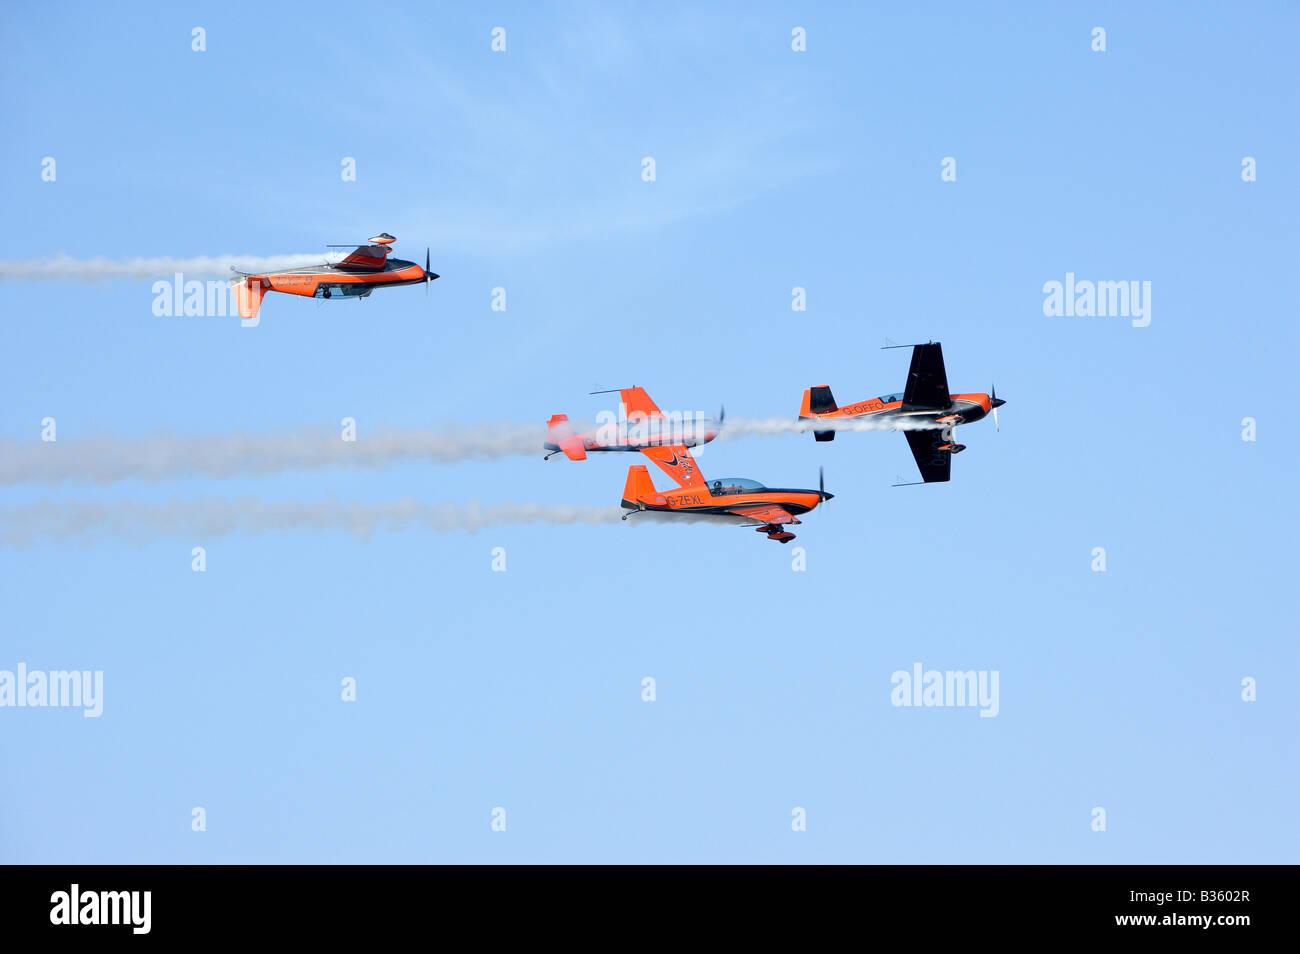 The Blades Aerobatic Team display over Bahrain - Stock Image